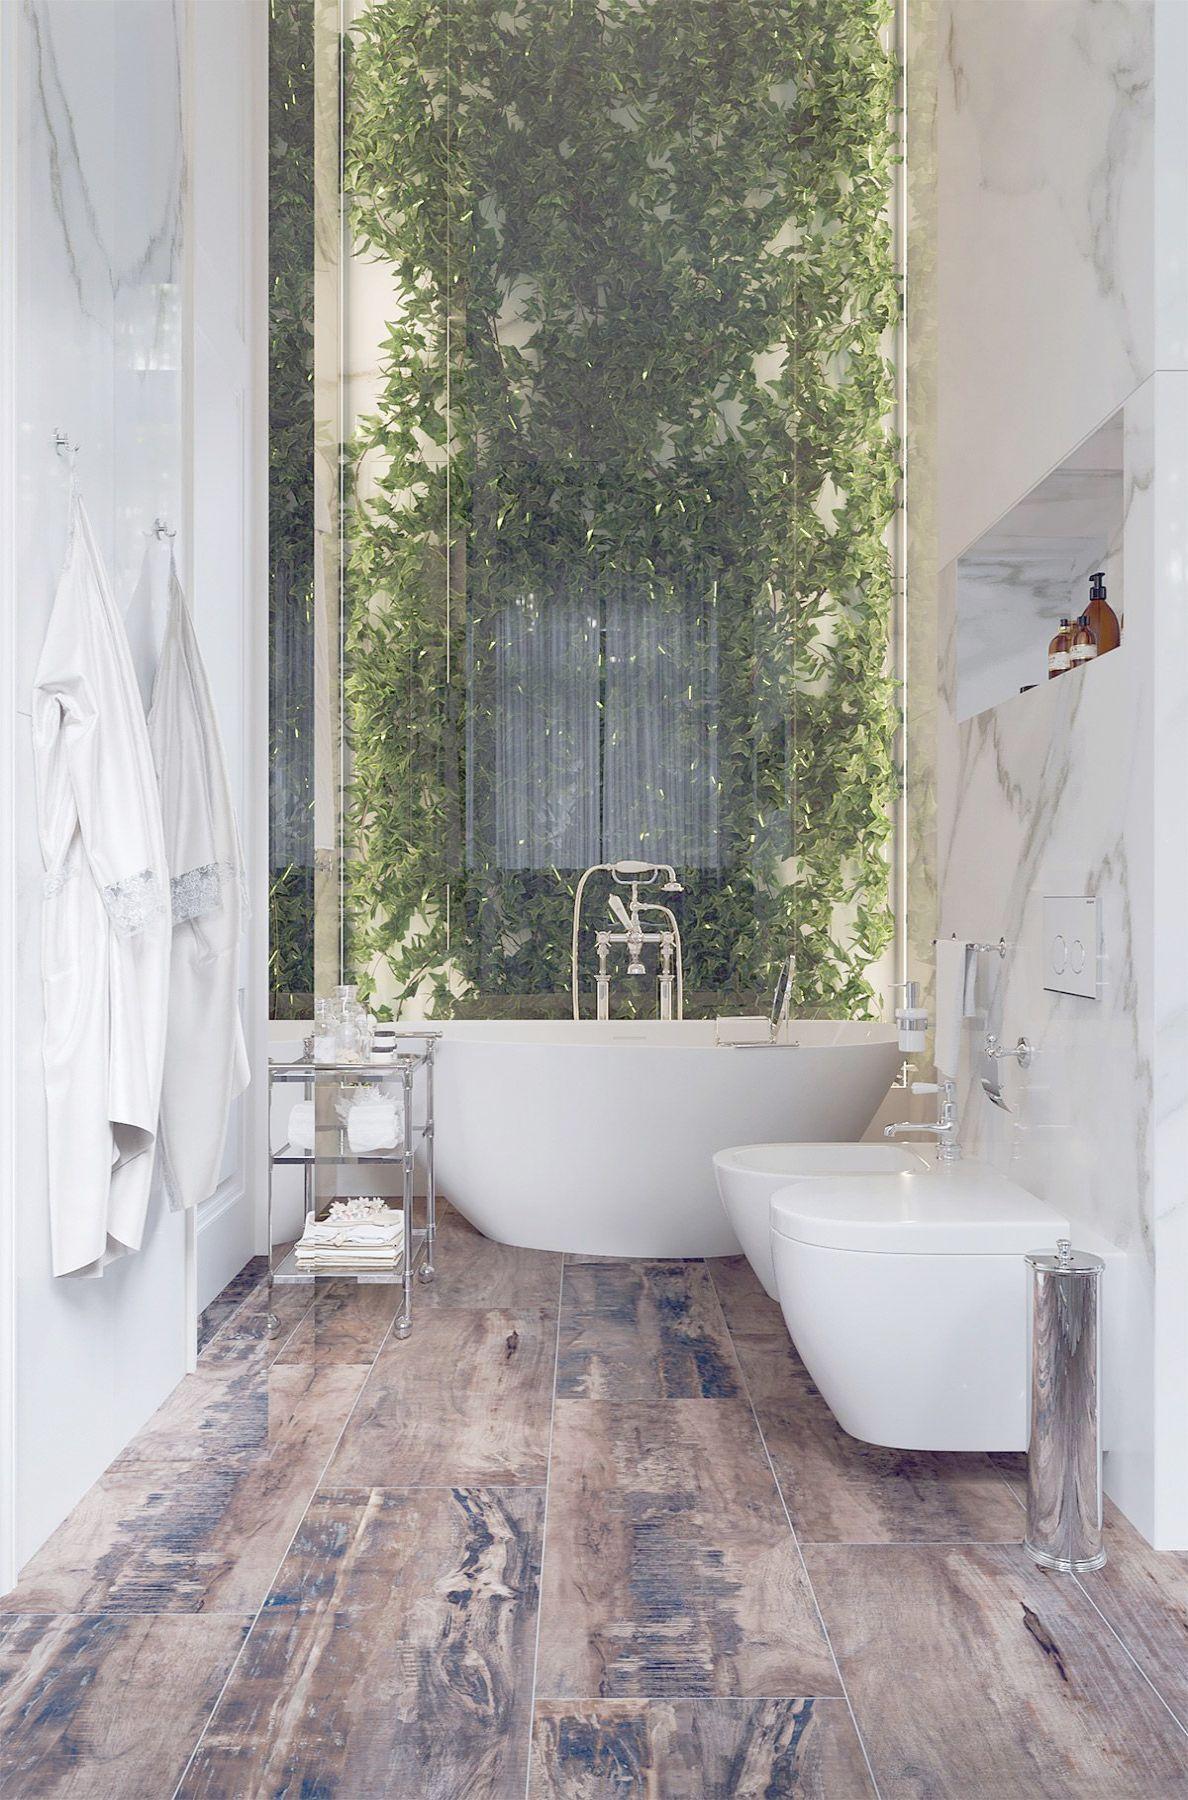 Luxury Bathrooms Northern Ireland Elegant John Bathrooms In Liquidation Luxurybathroomsnorthernirel Minimalist Bathroom Design Luxury Bathroom Bathroom Design